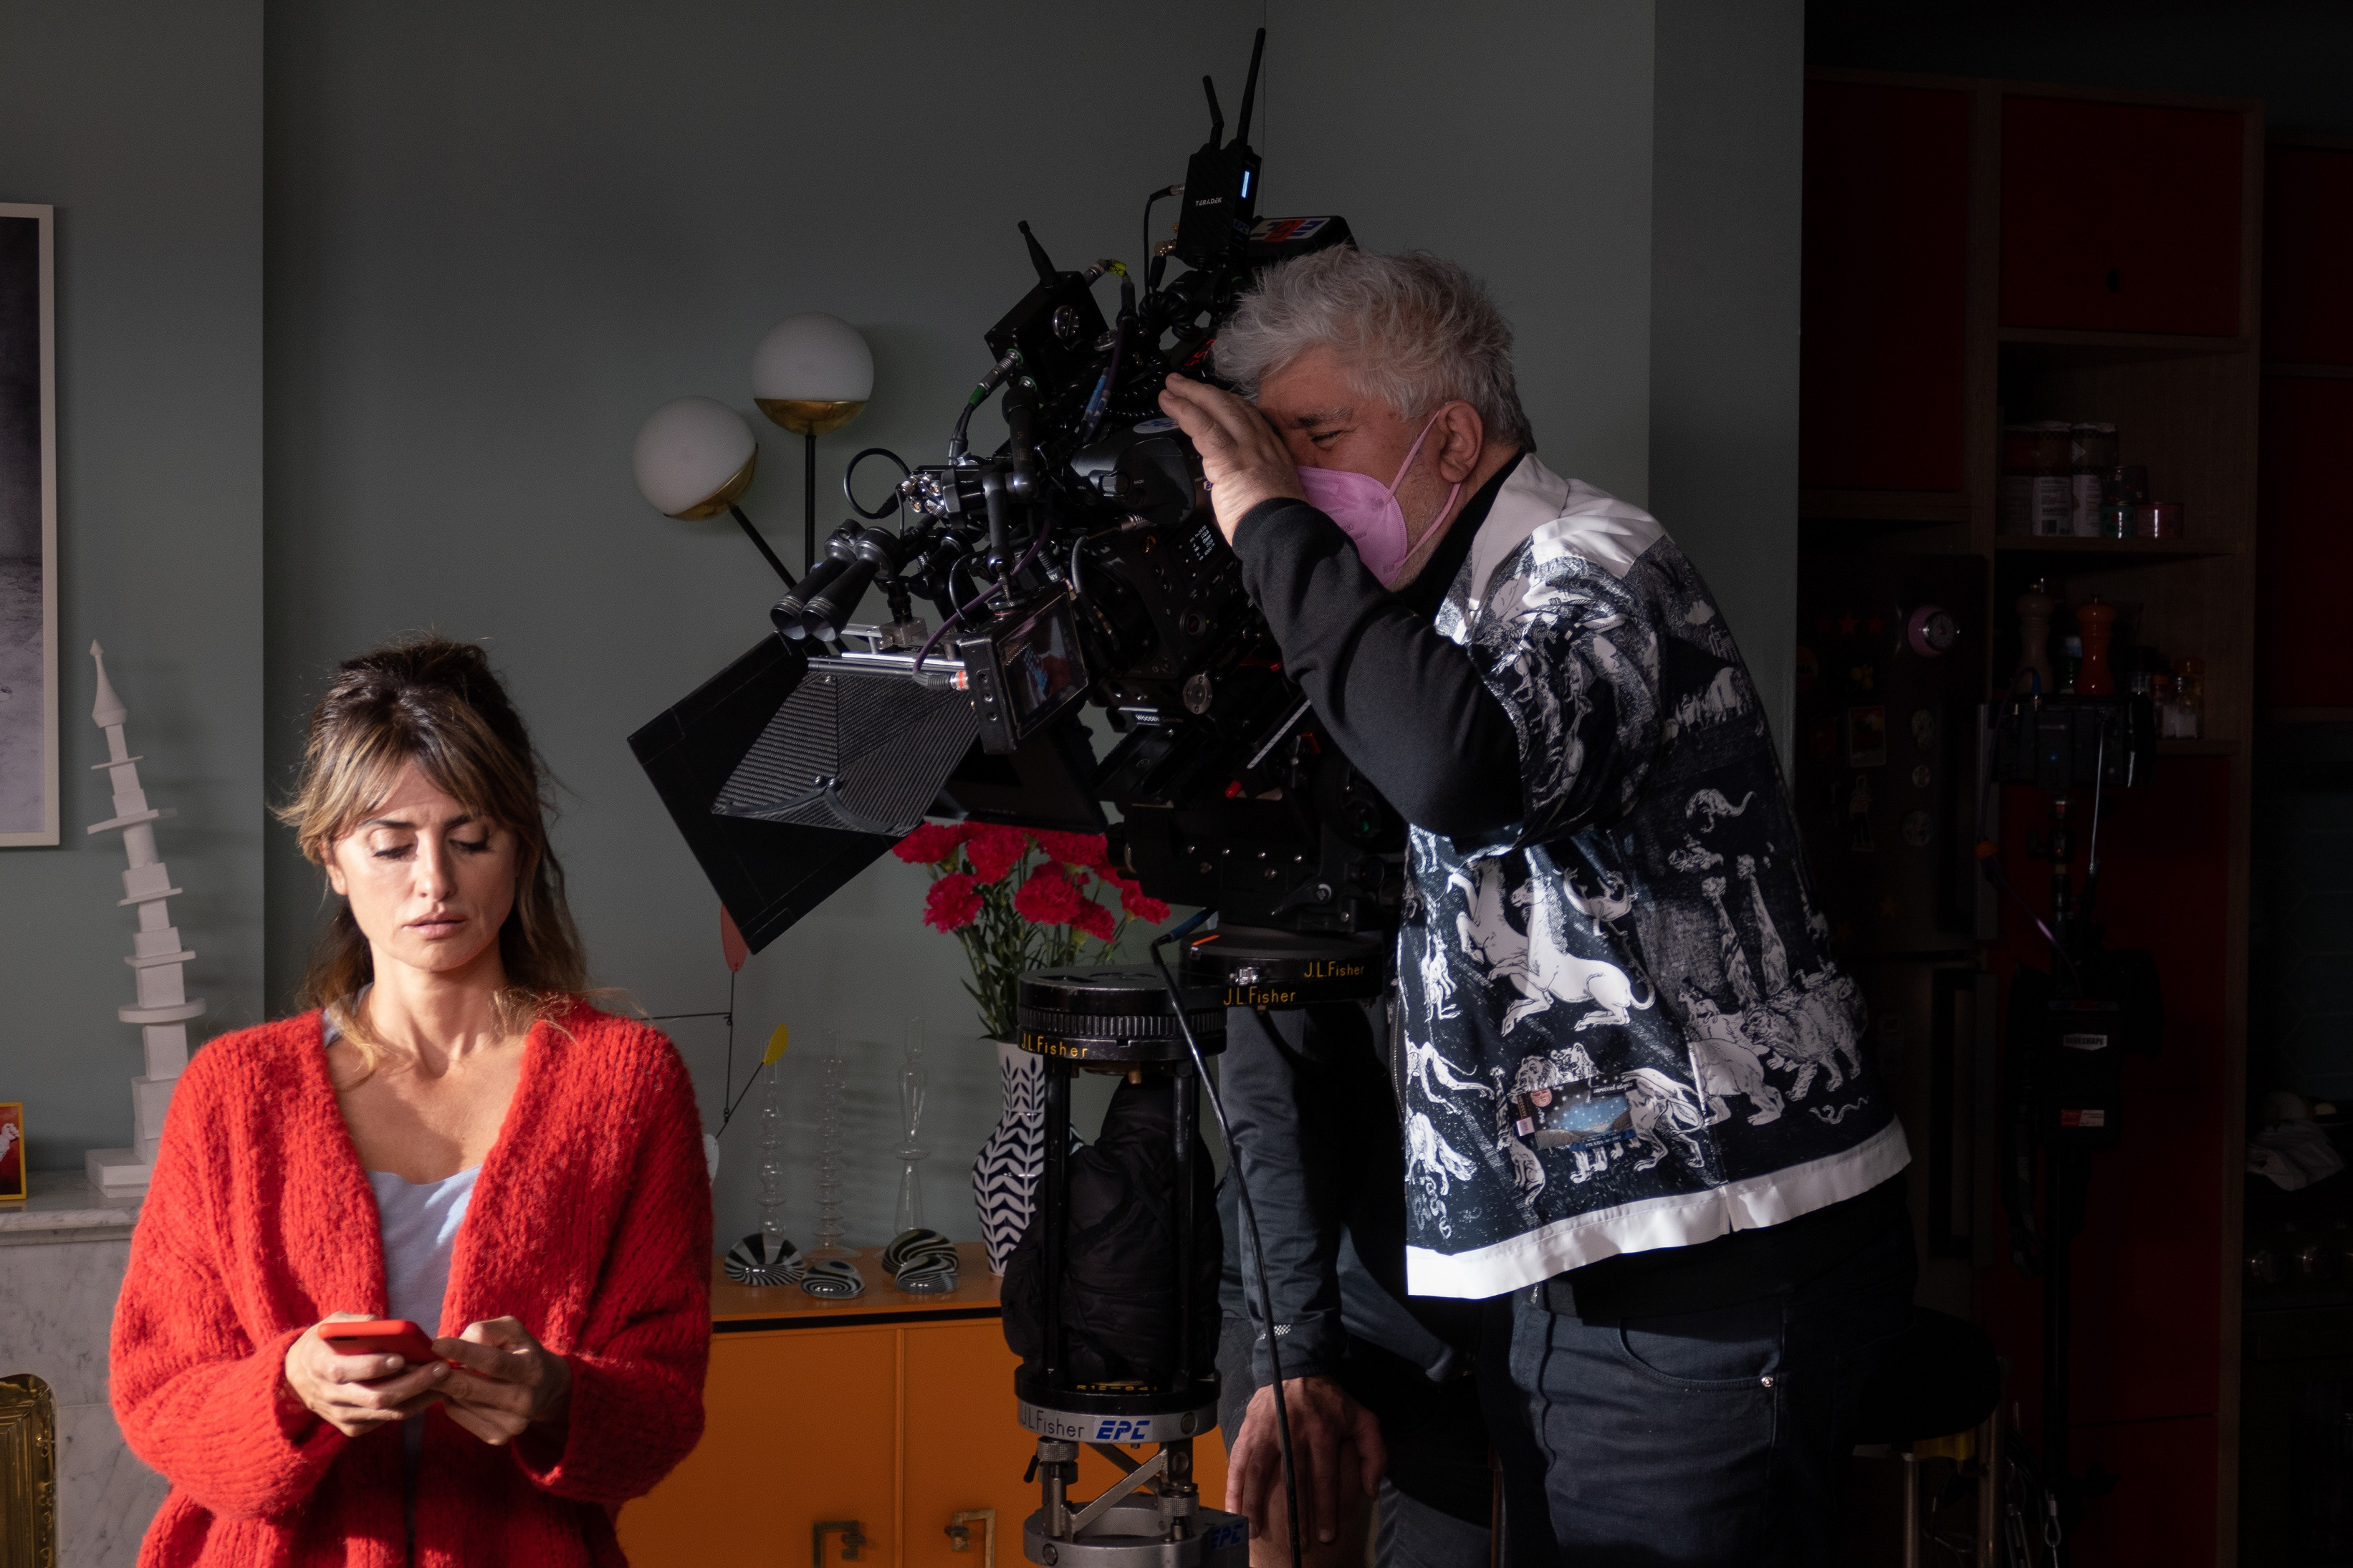 Penélope Cruz and Pedro Almodóvar filming 'Parallel Mothers'